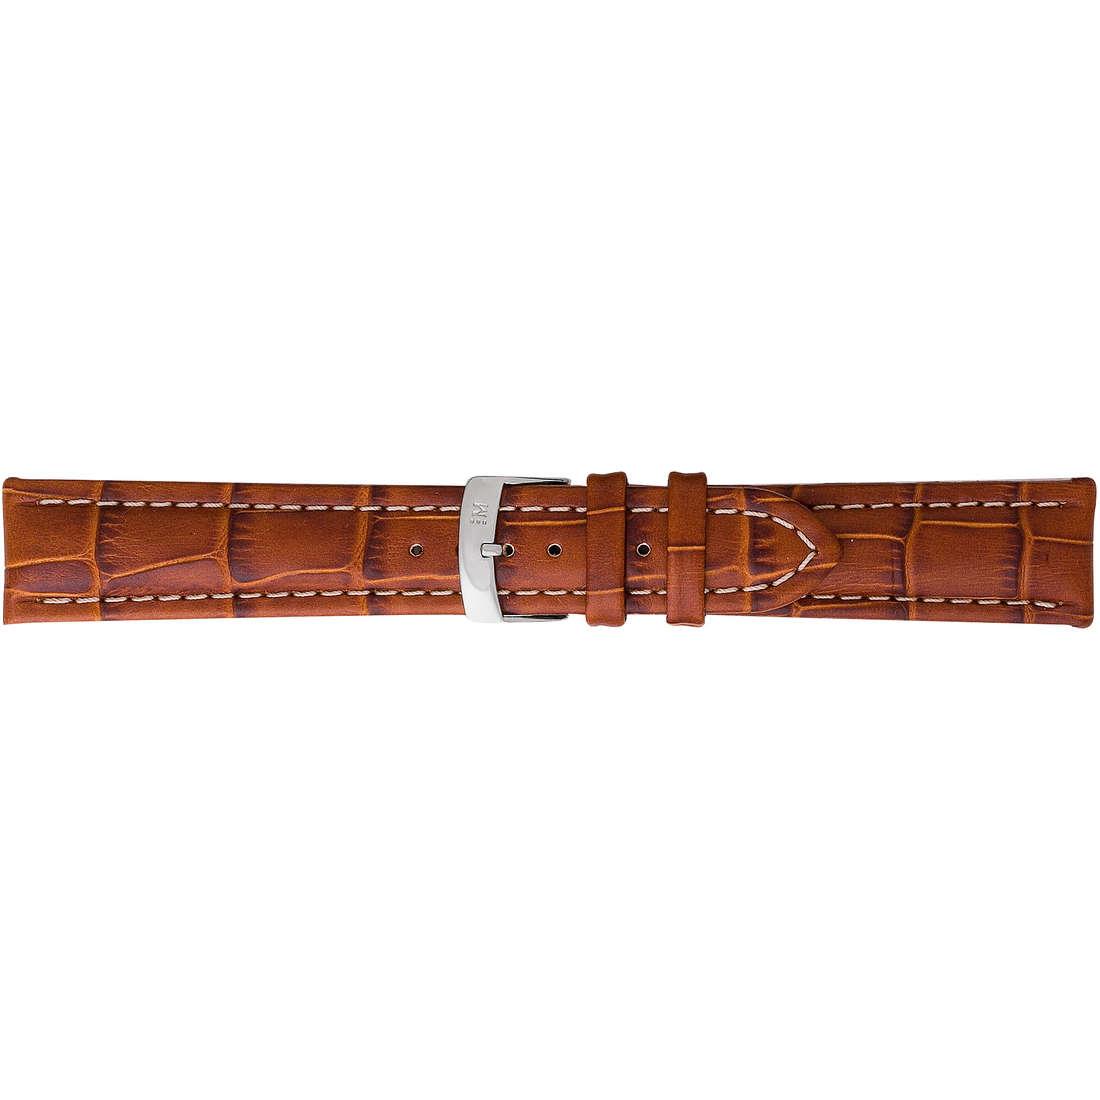 watch watch bands watch straps man Morellato Morellato 1930 A01U3252480041CR22